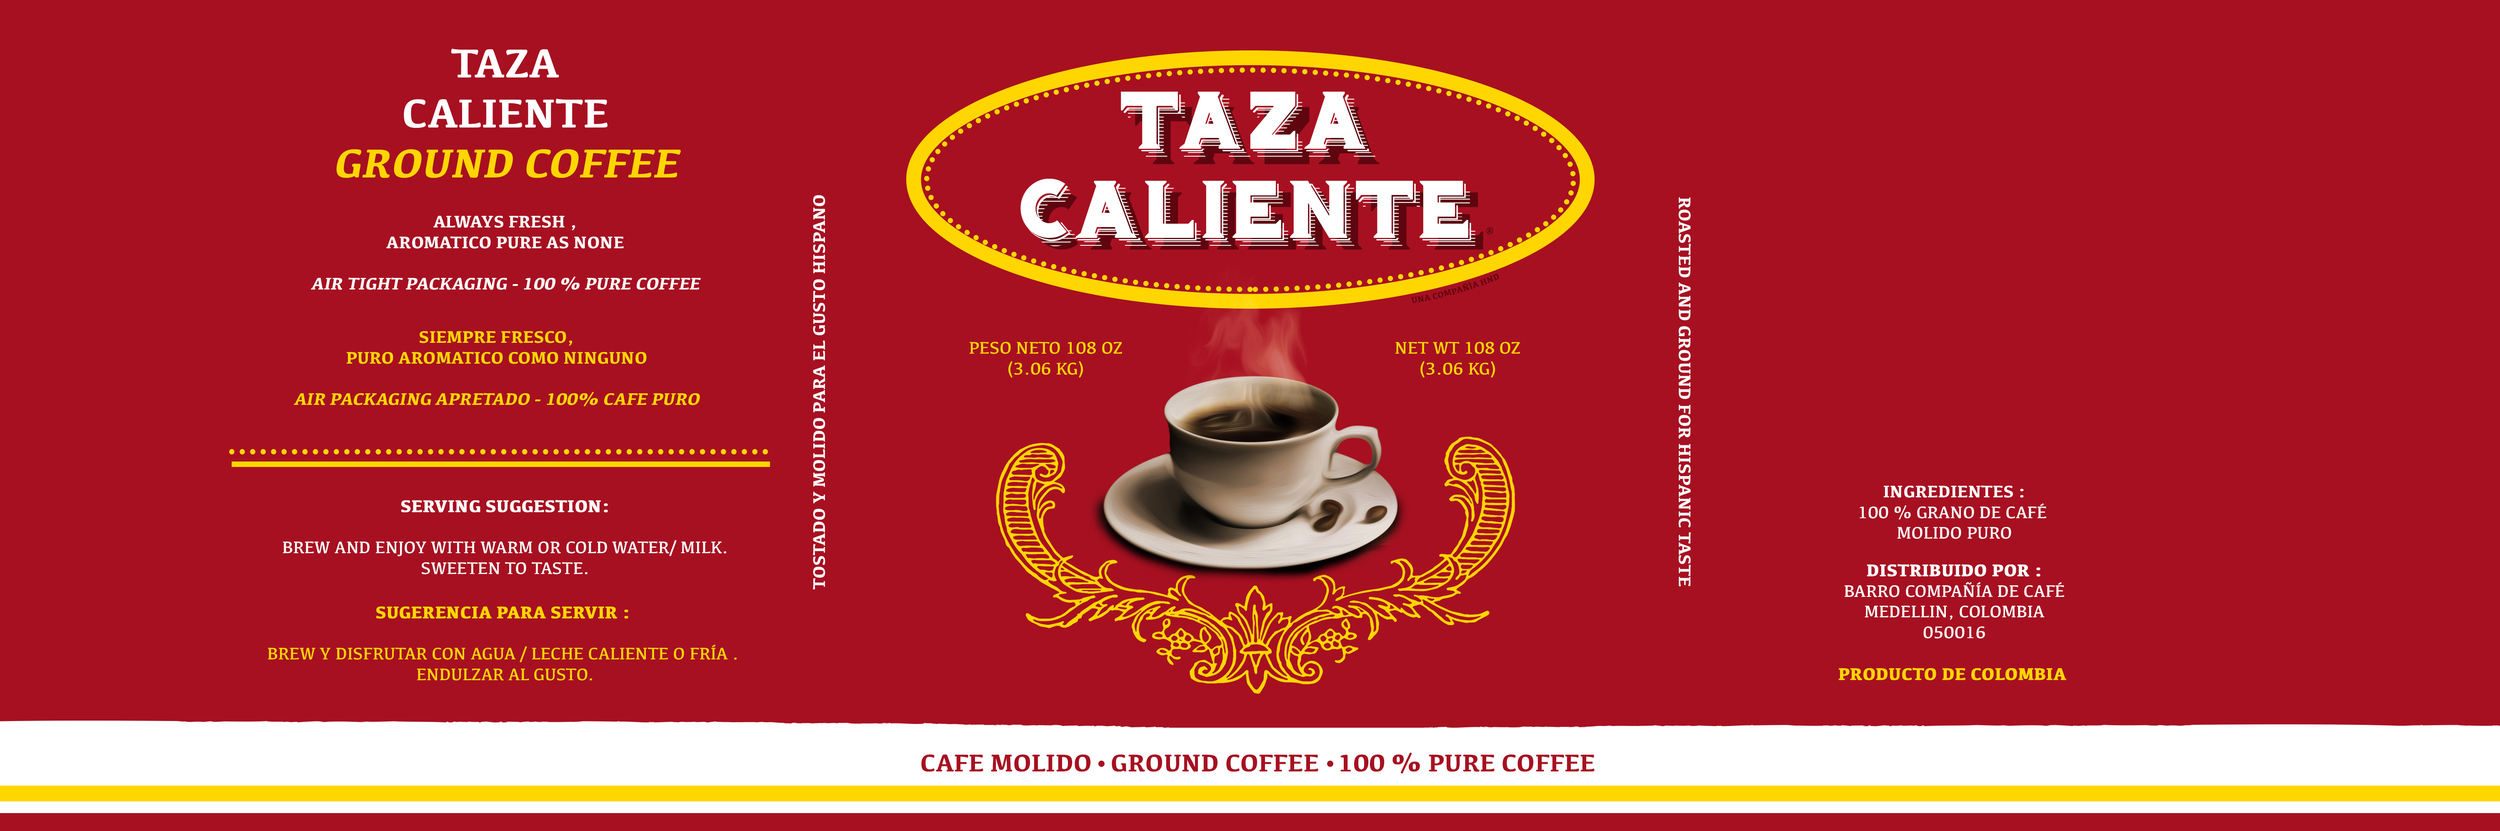 Coffee_label.jpg